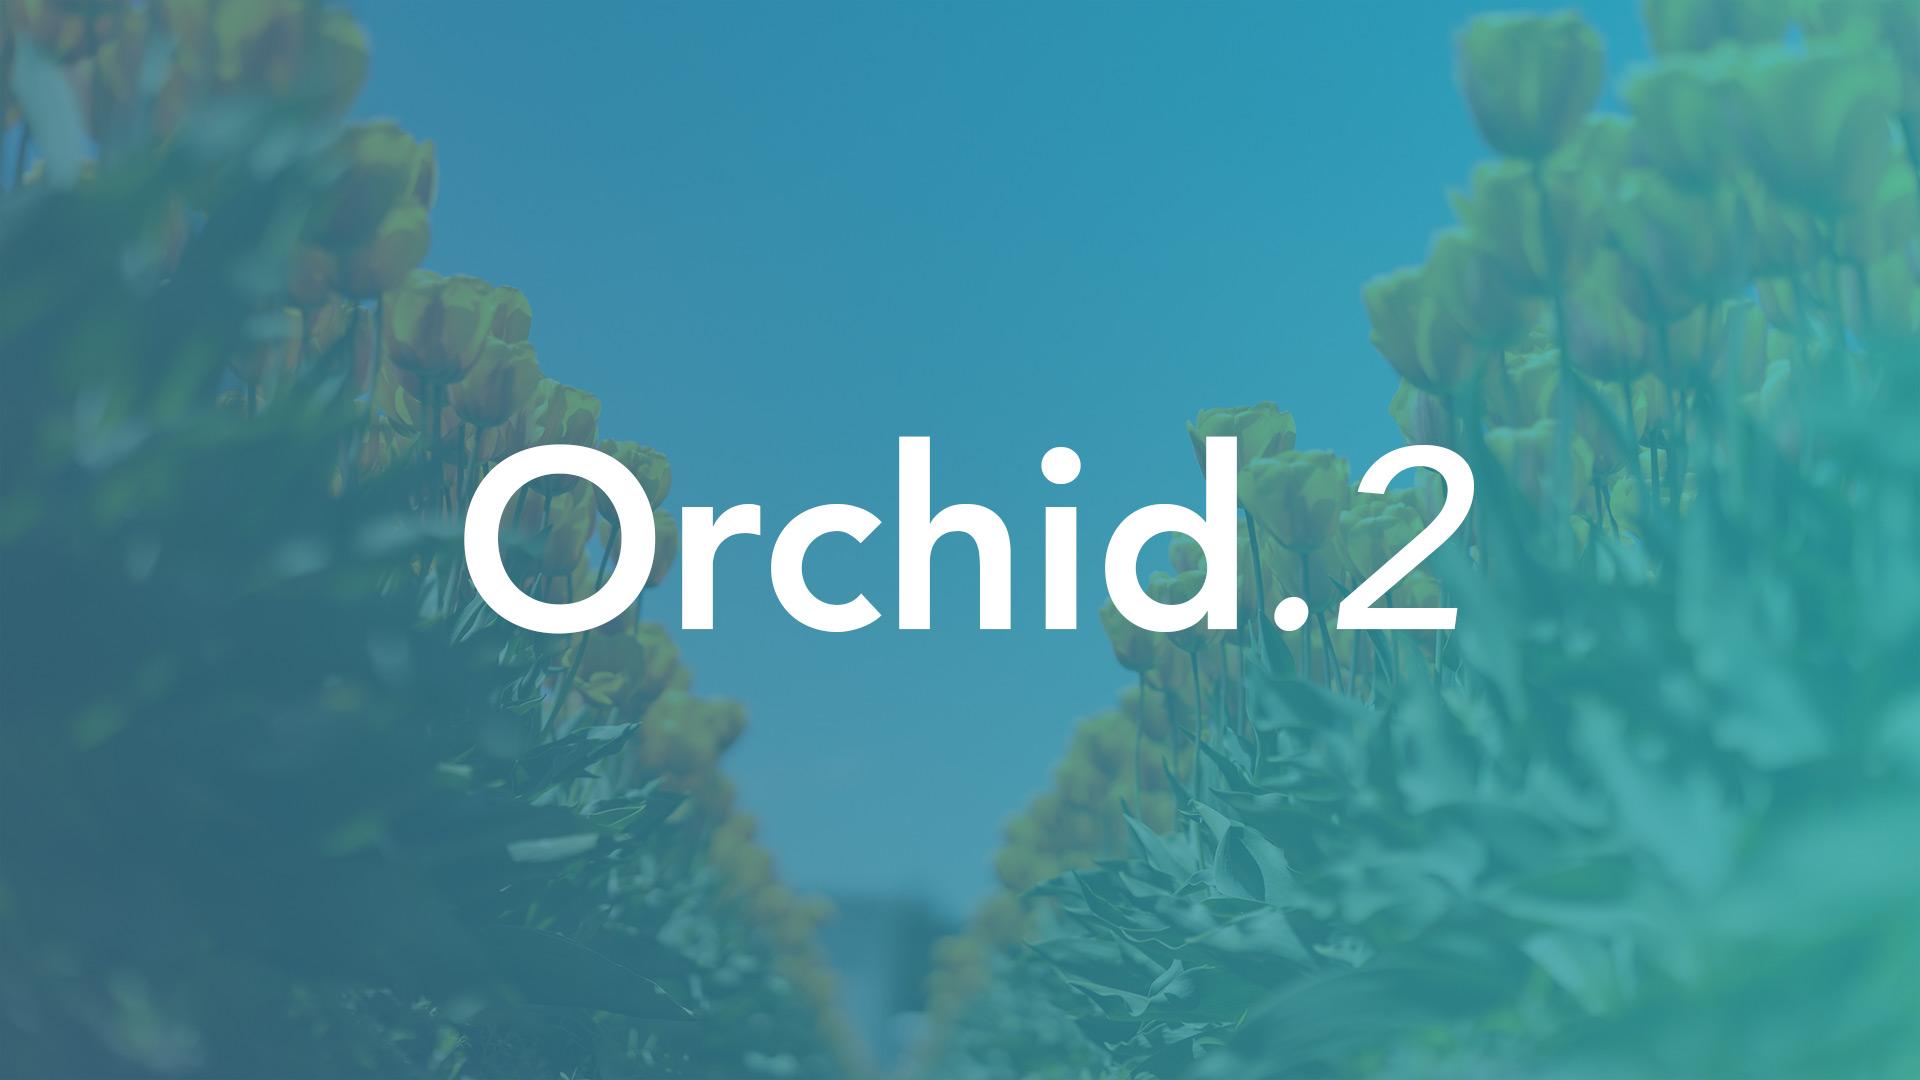 CodeGrade version Orchid.2